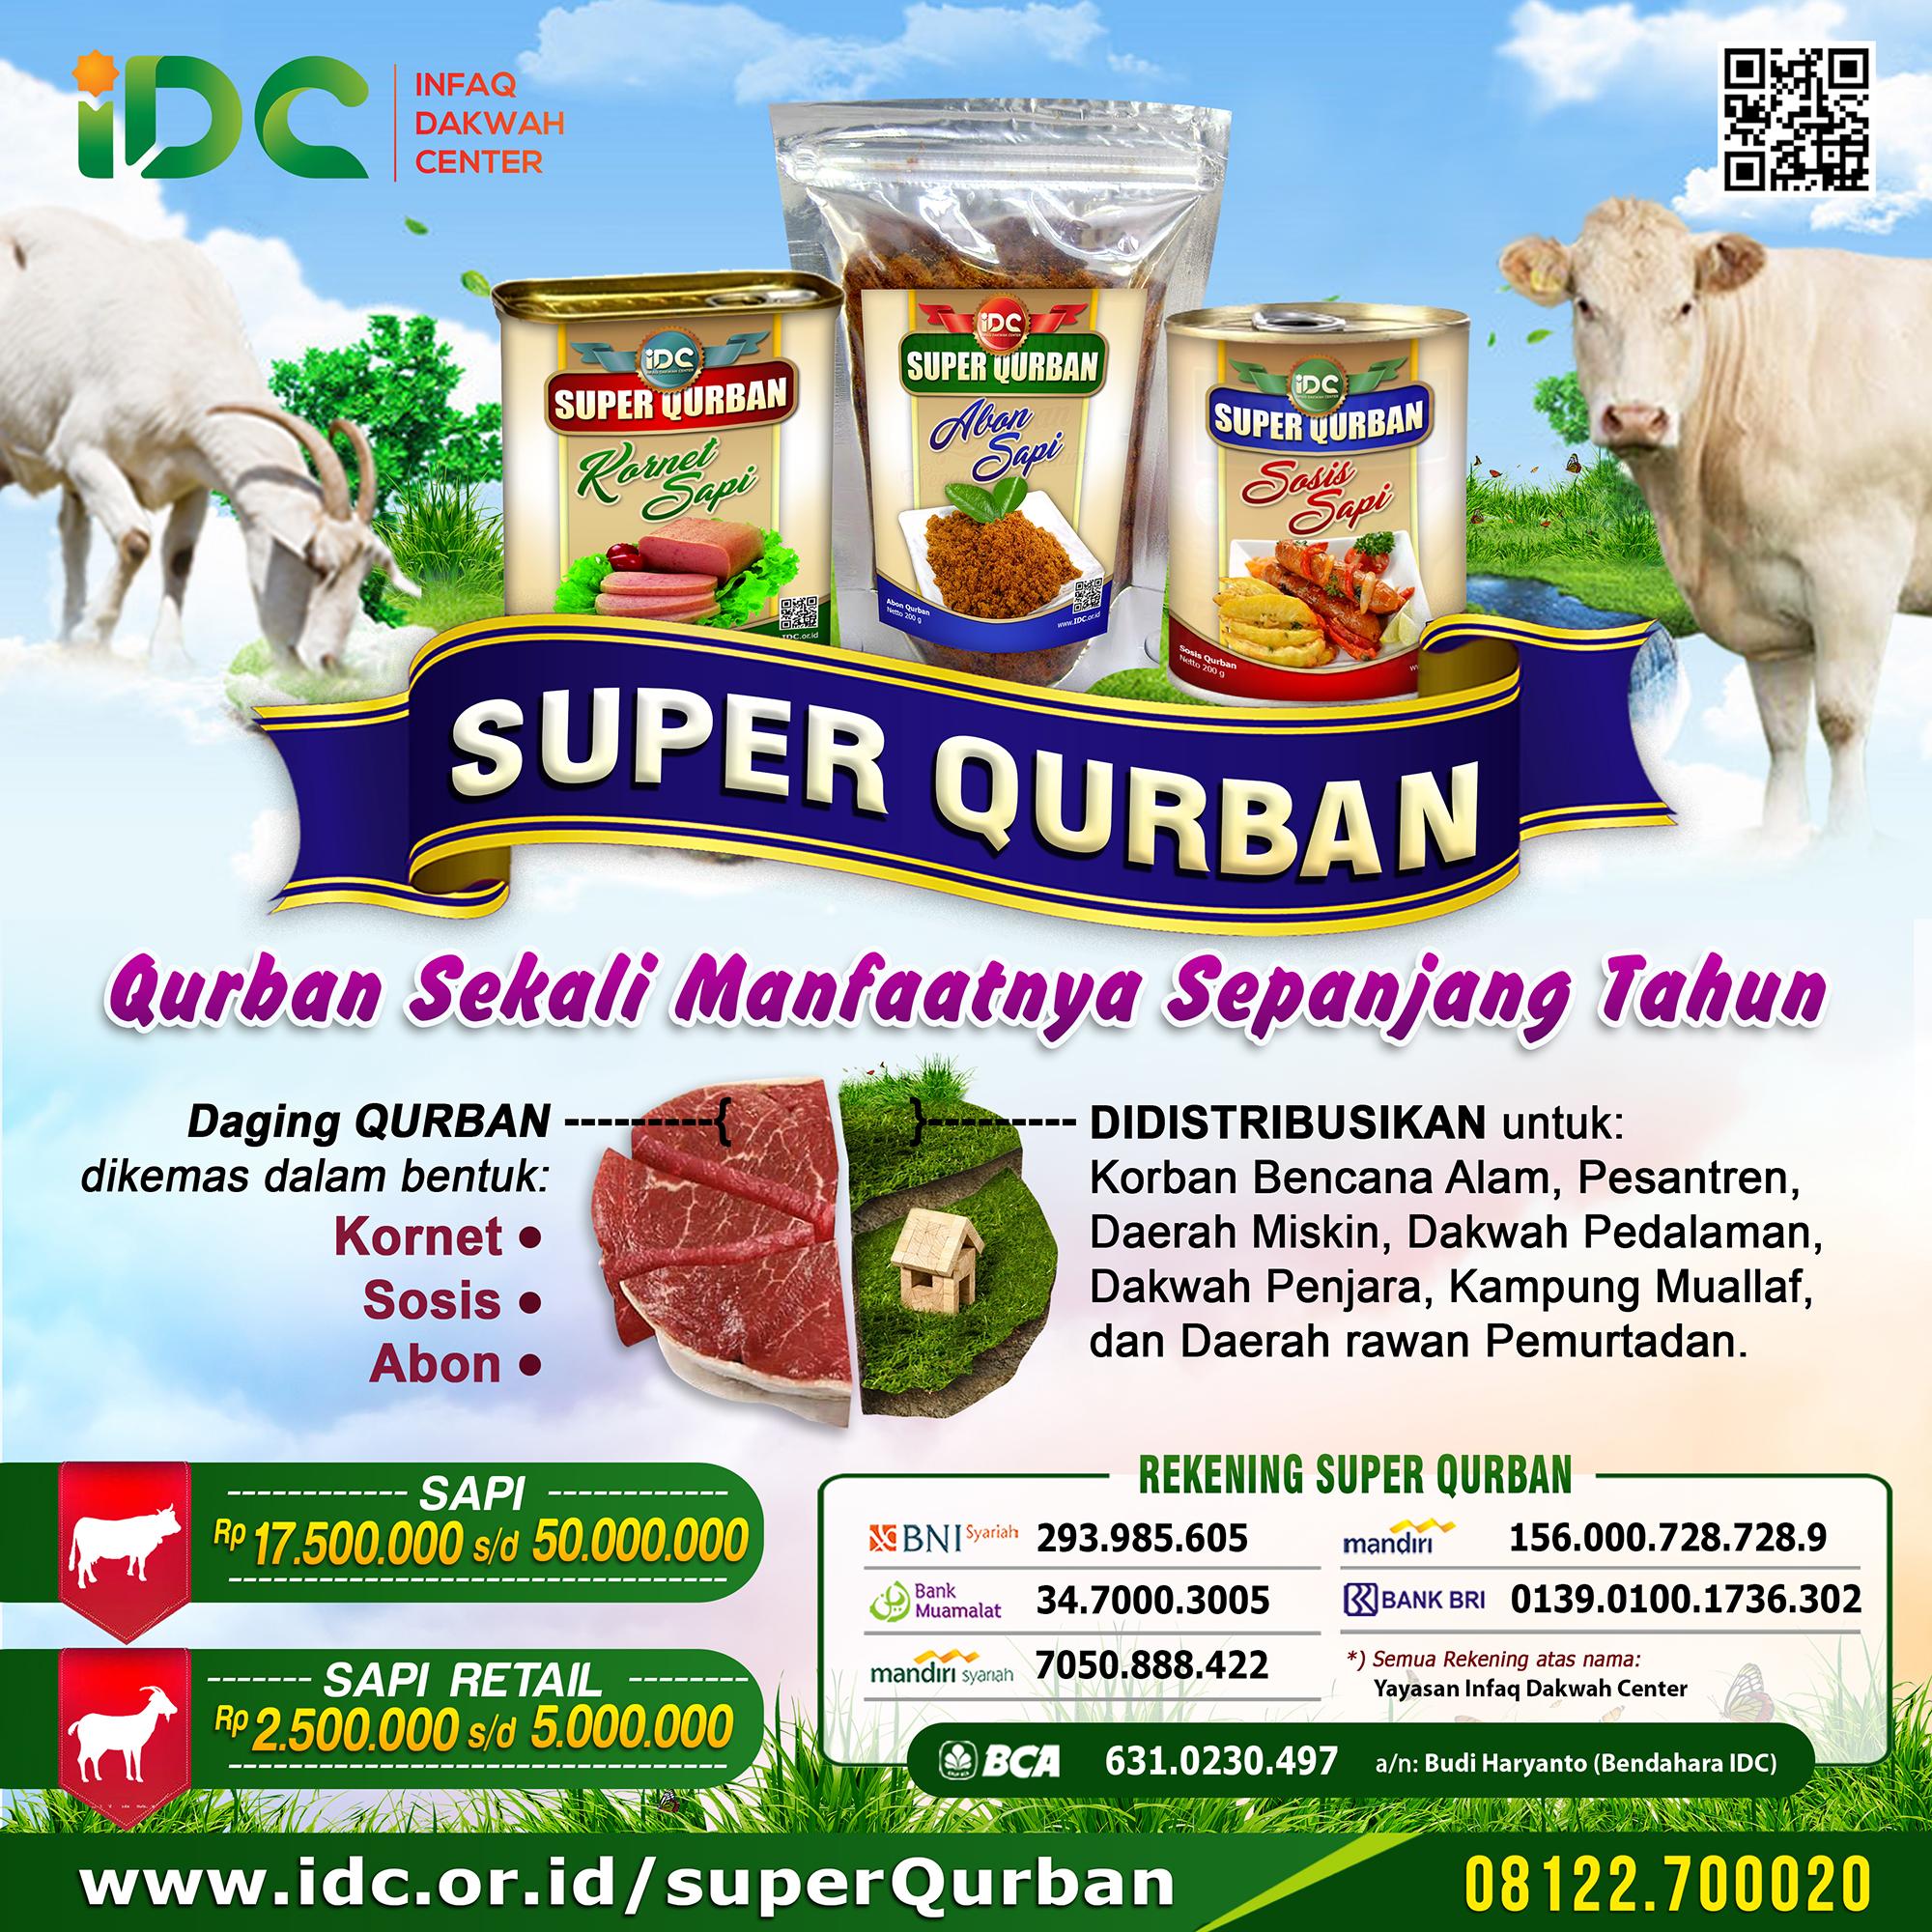 Super Qurban Abadi Berqurban Sekali Manfaatnya Mengalir Sepanjang Tahun